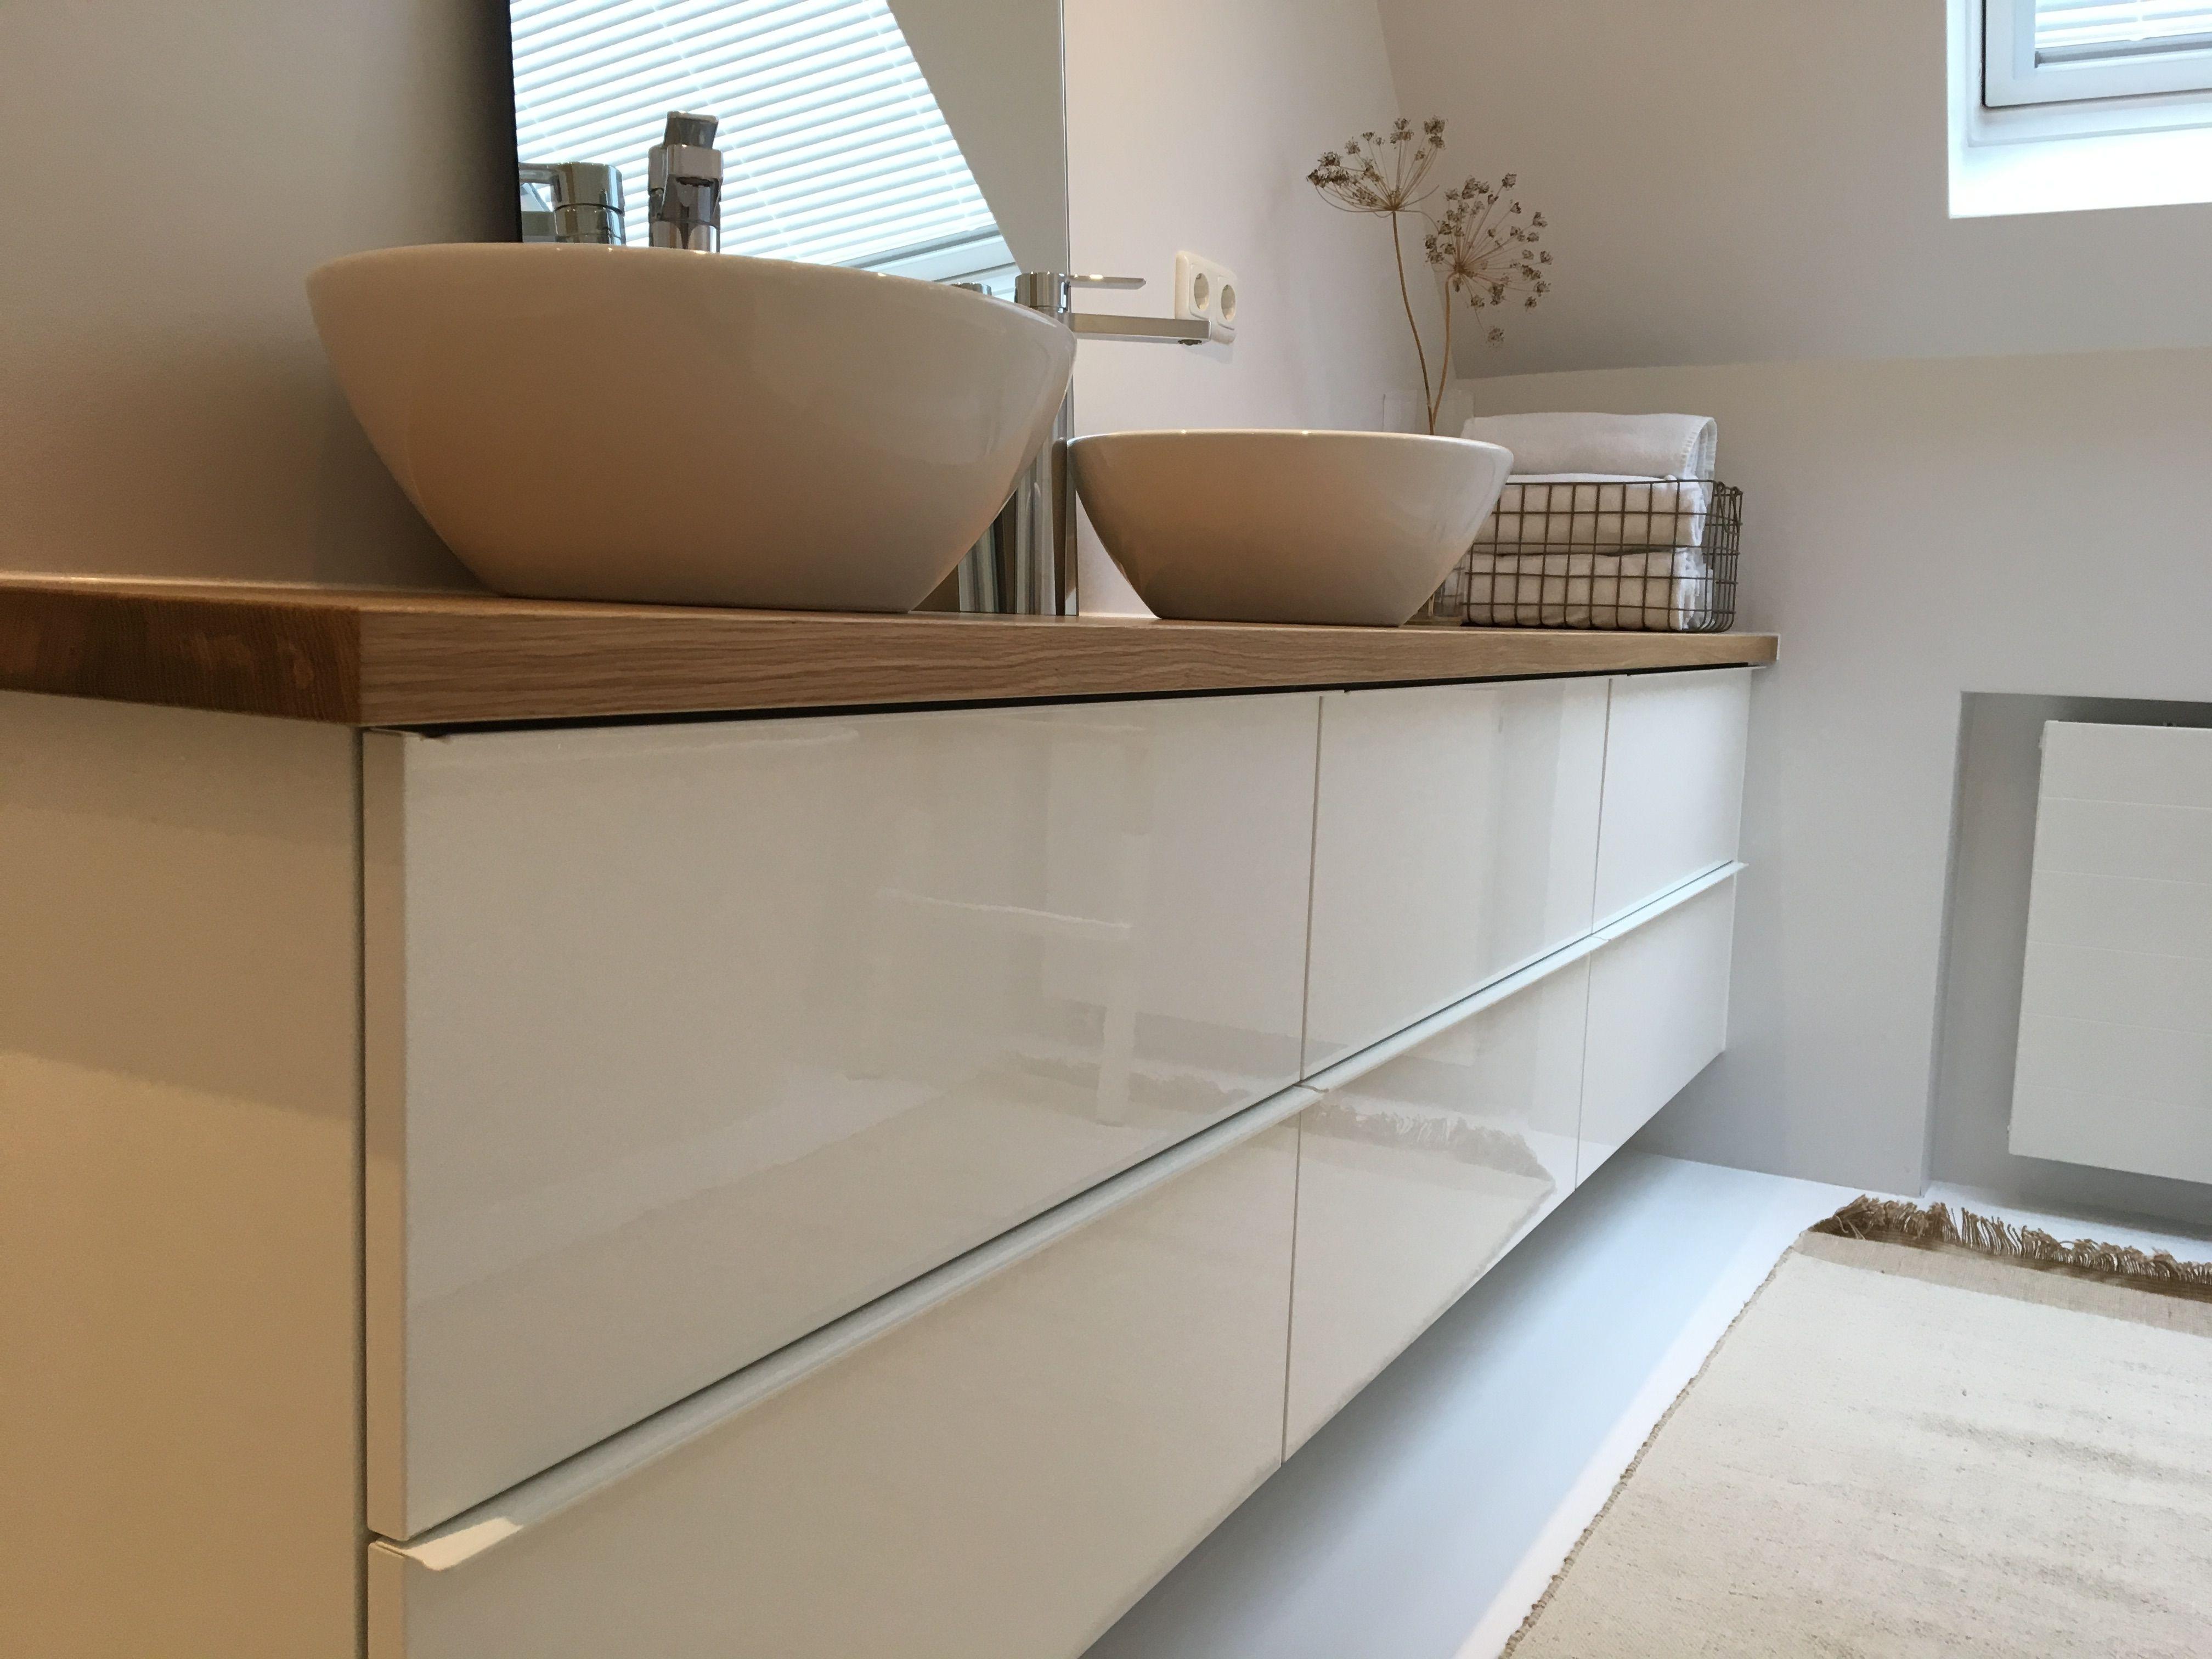 Staande Spiegel Ikea : Ikea badmeubelen. perfect ikea badmeubelen with ikea badmeubelen